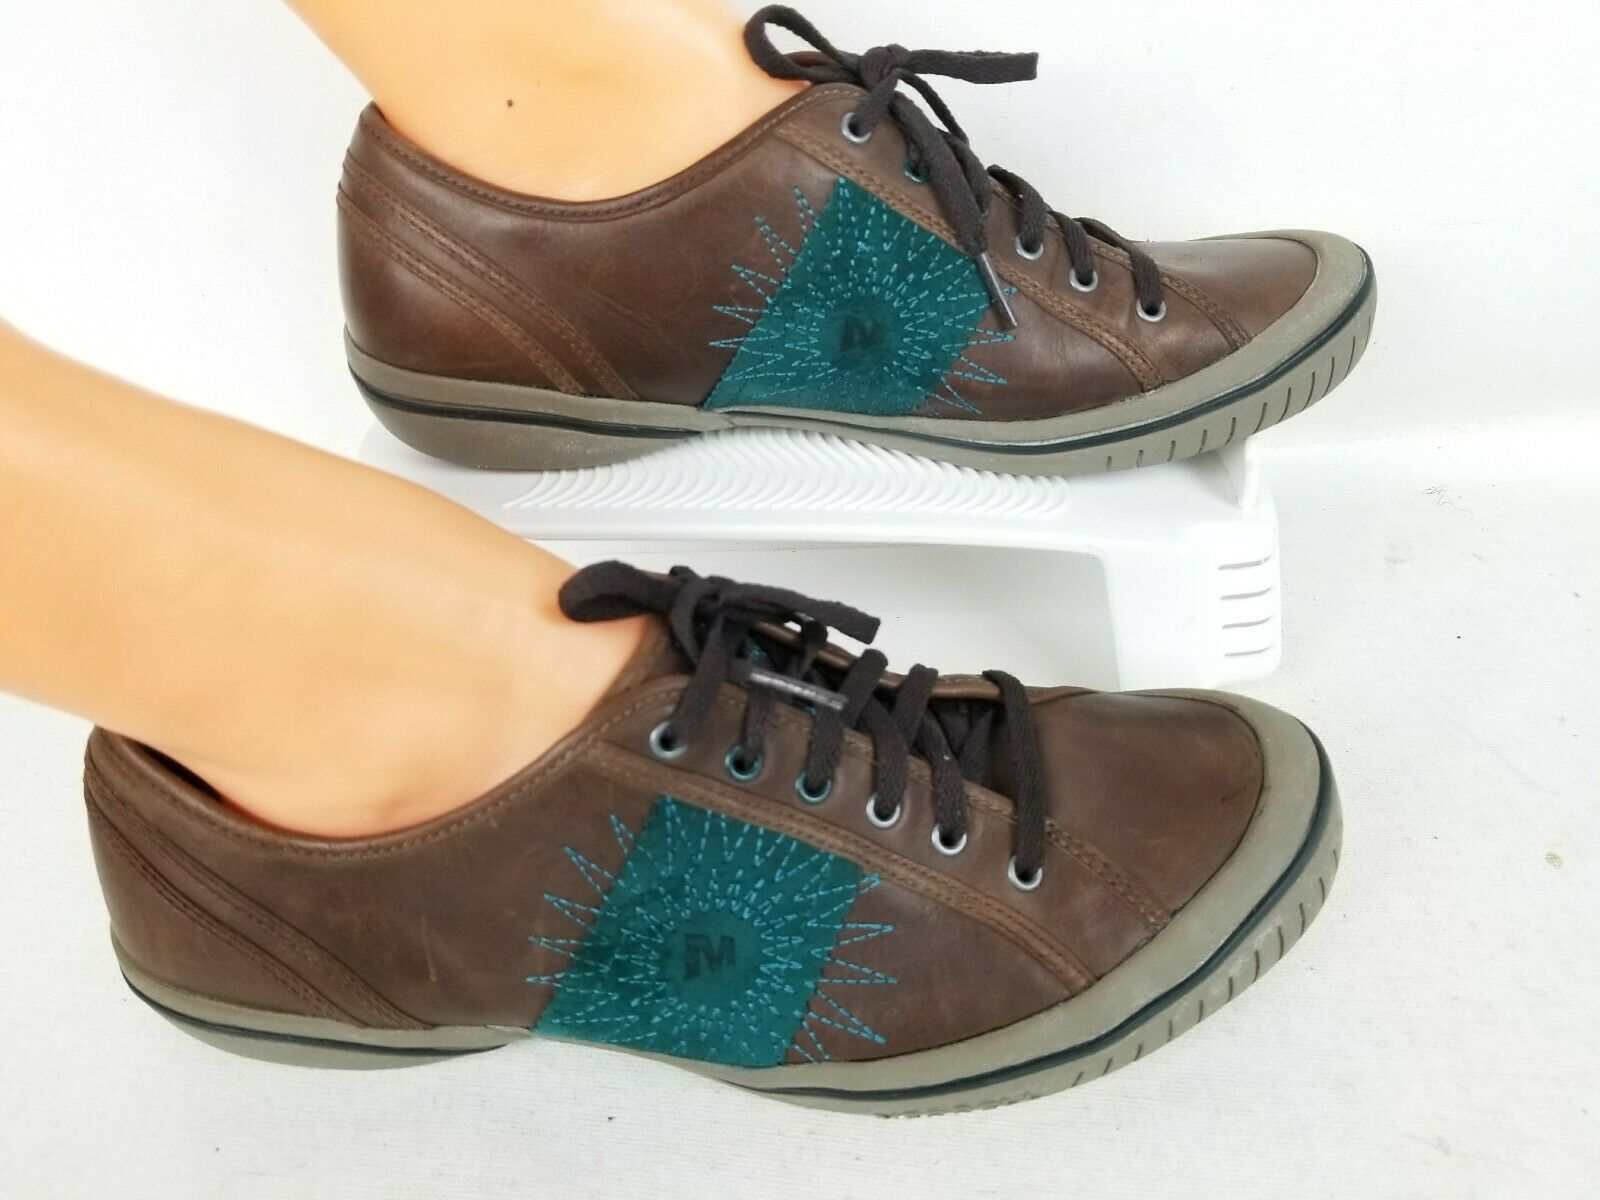 Merrell stardark Marrón Cuero Para mujeres Zapatos Para Caminar Deportiva